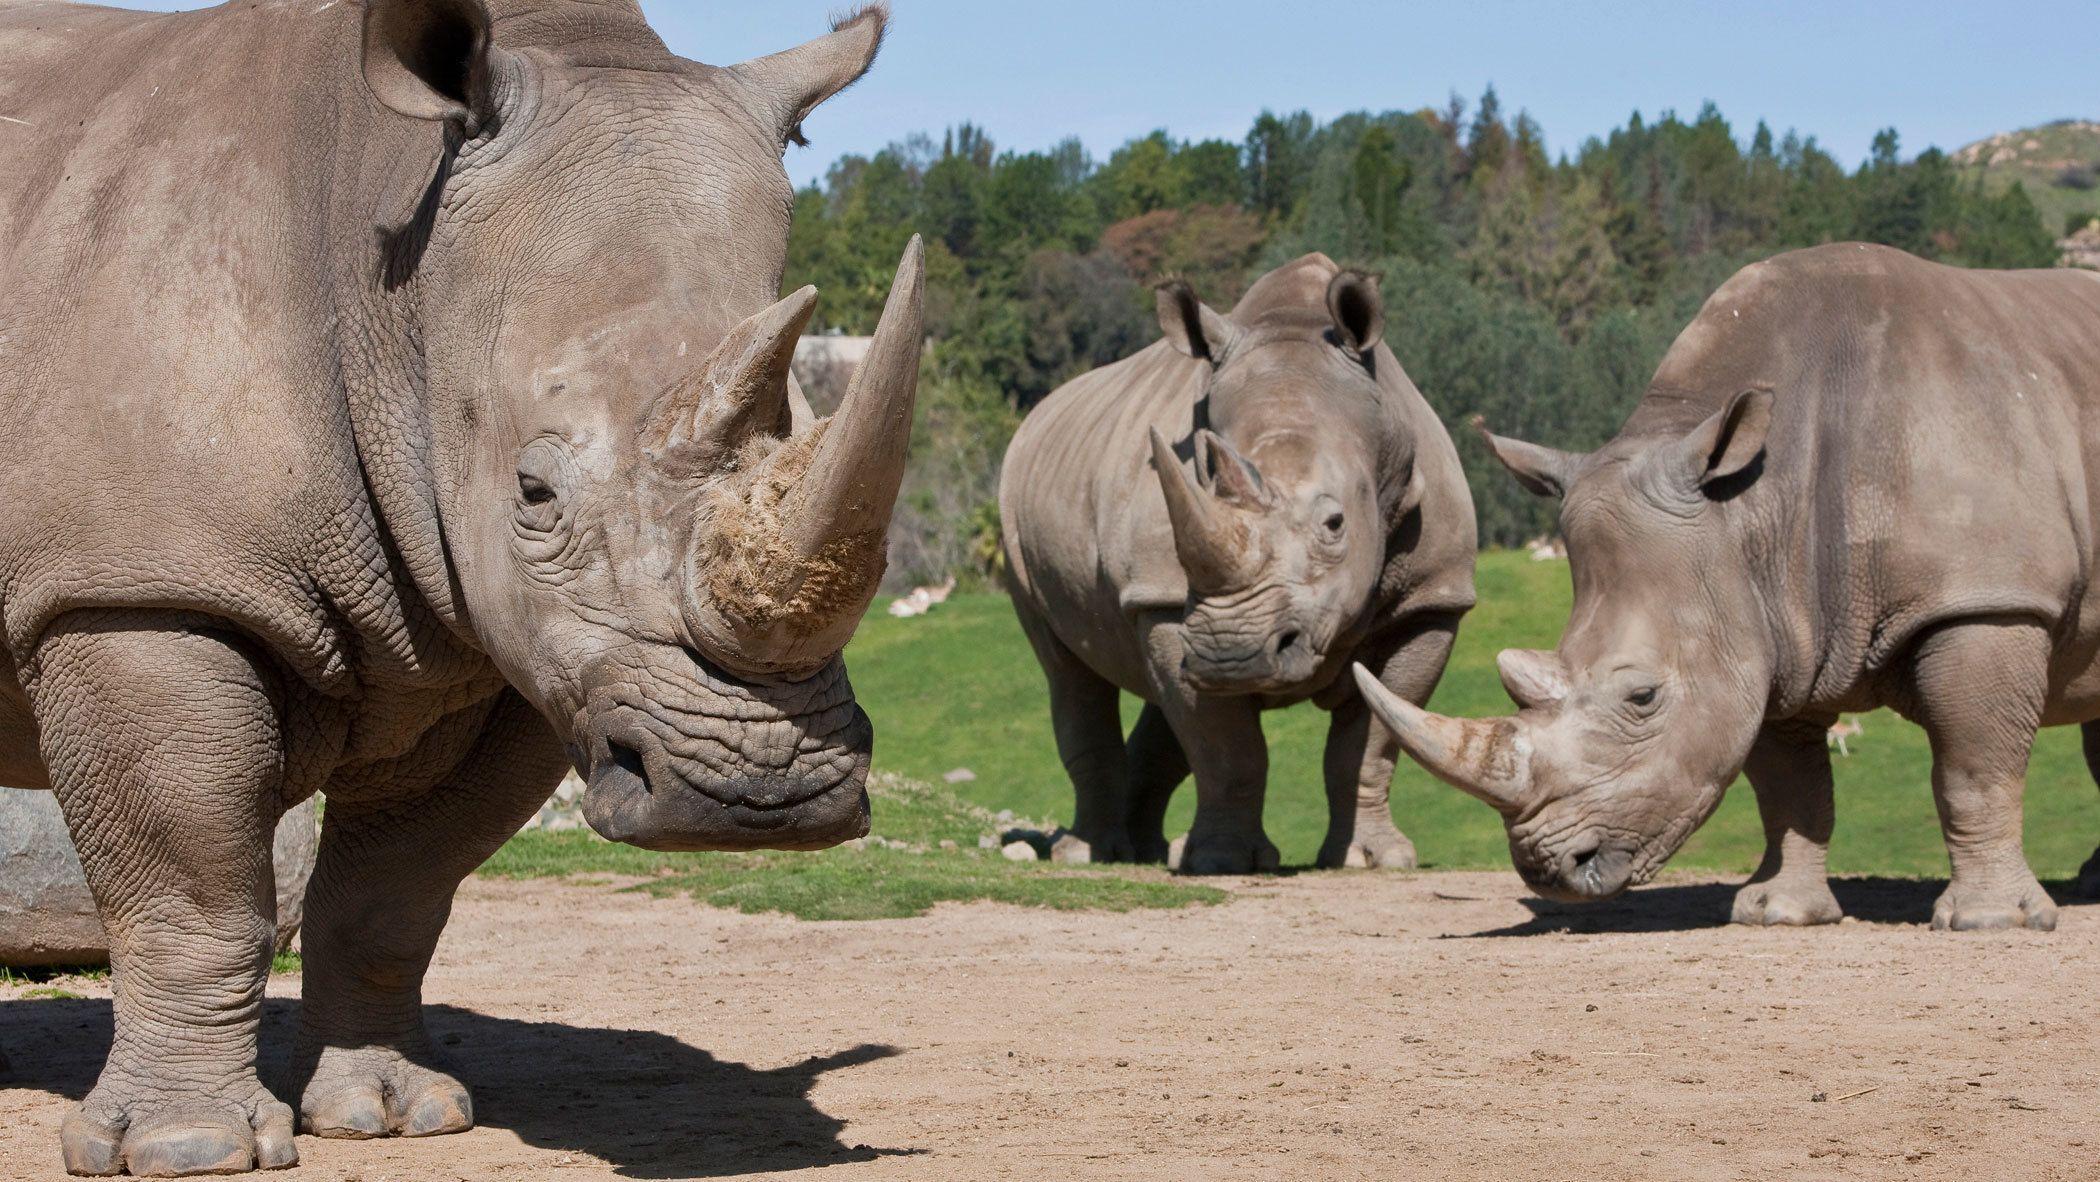 Rhinos at the Safari Park in San Diego Zoo